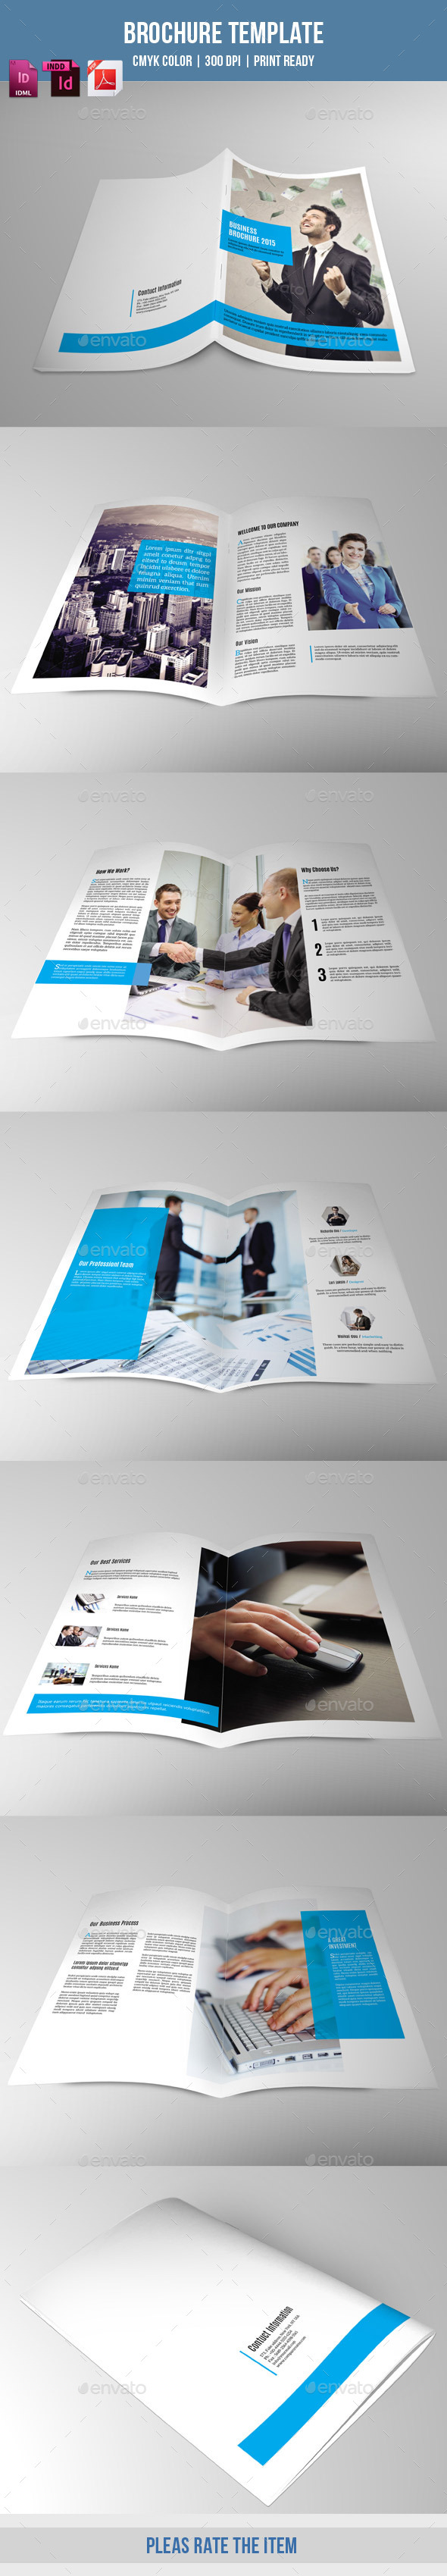 Bifold Brochure for Business-V162